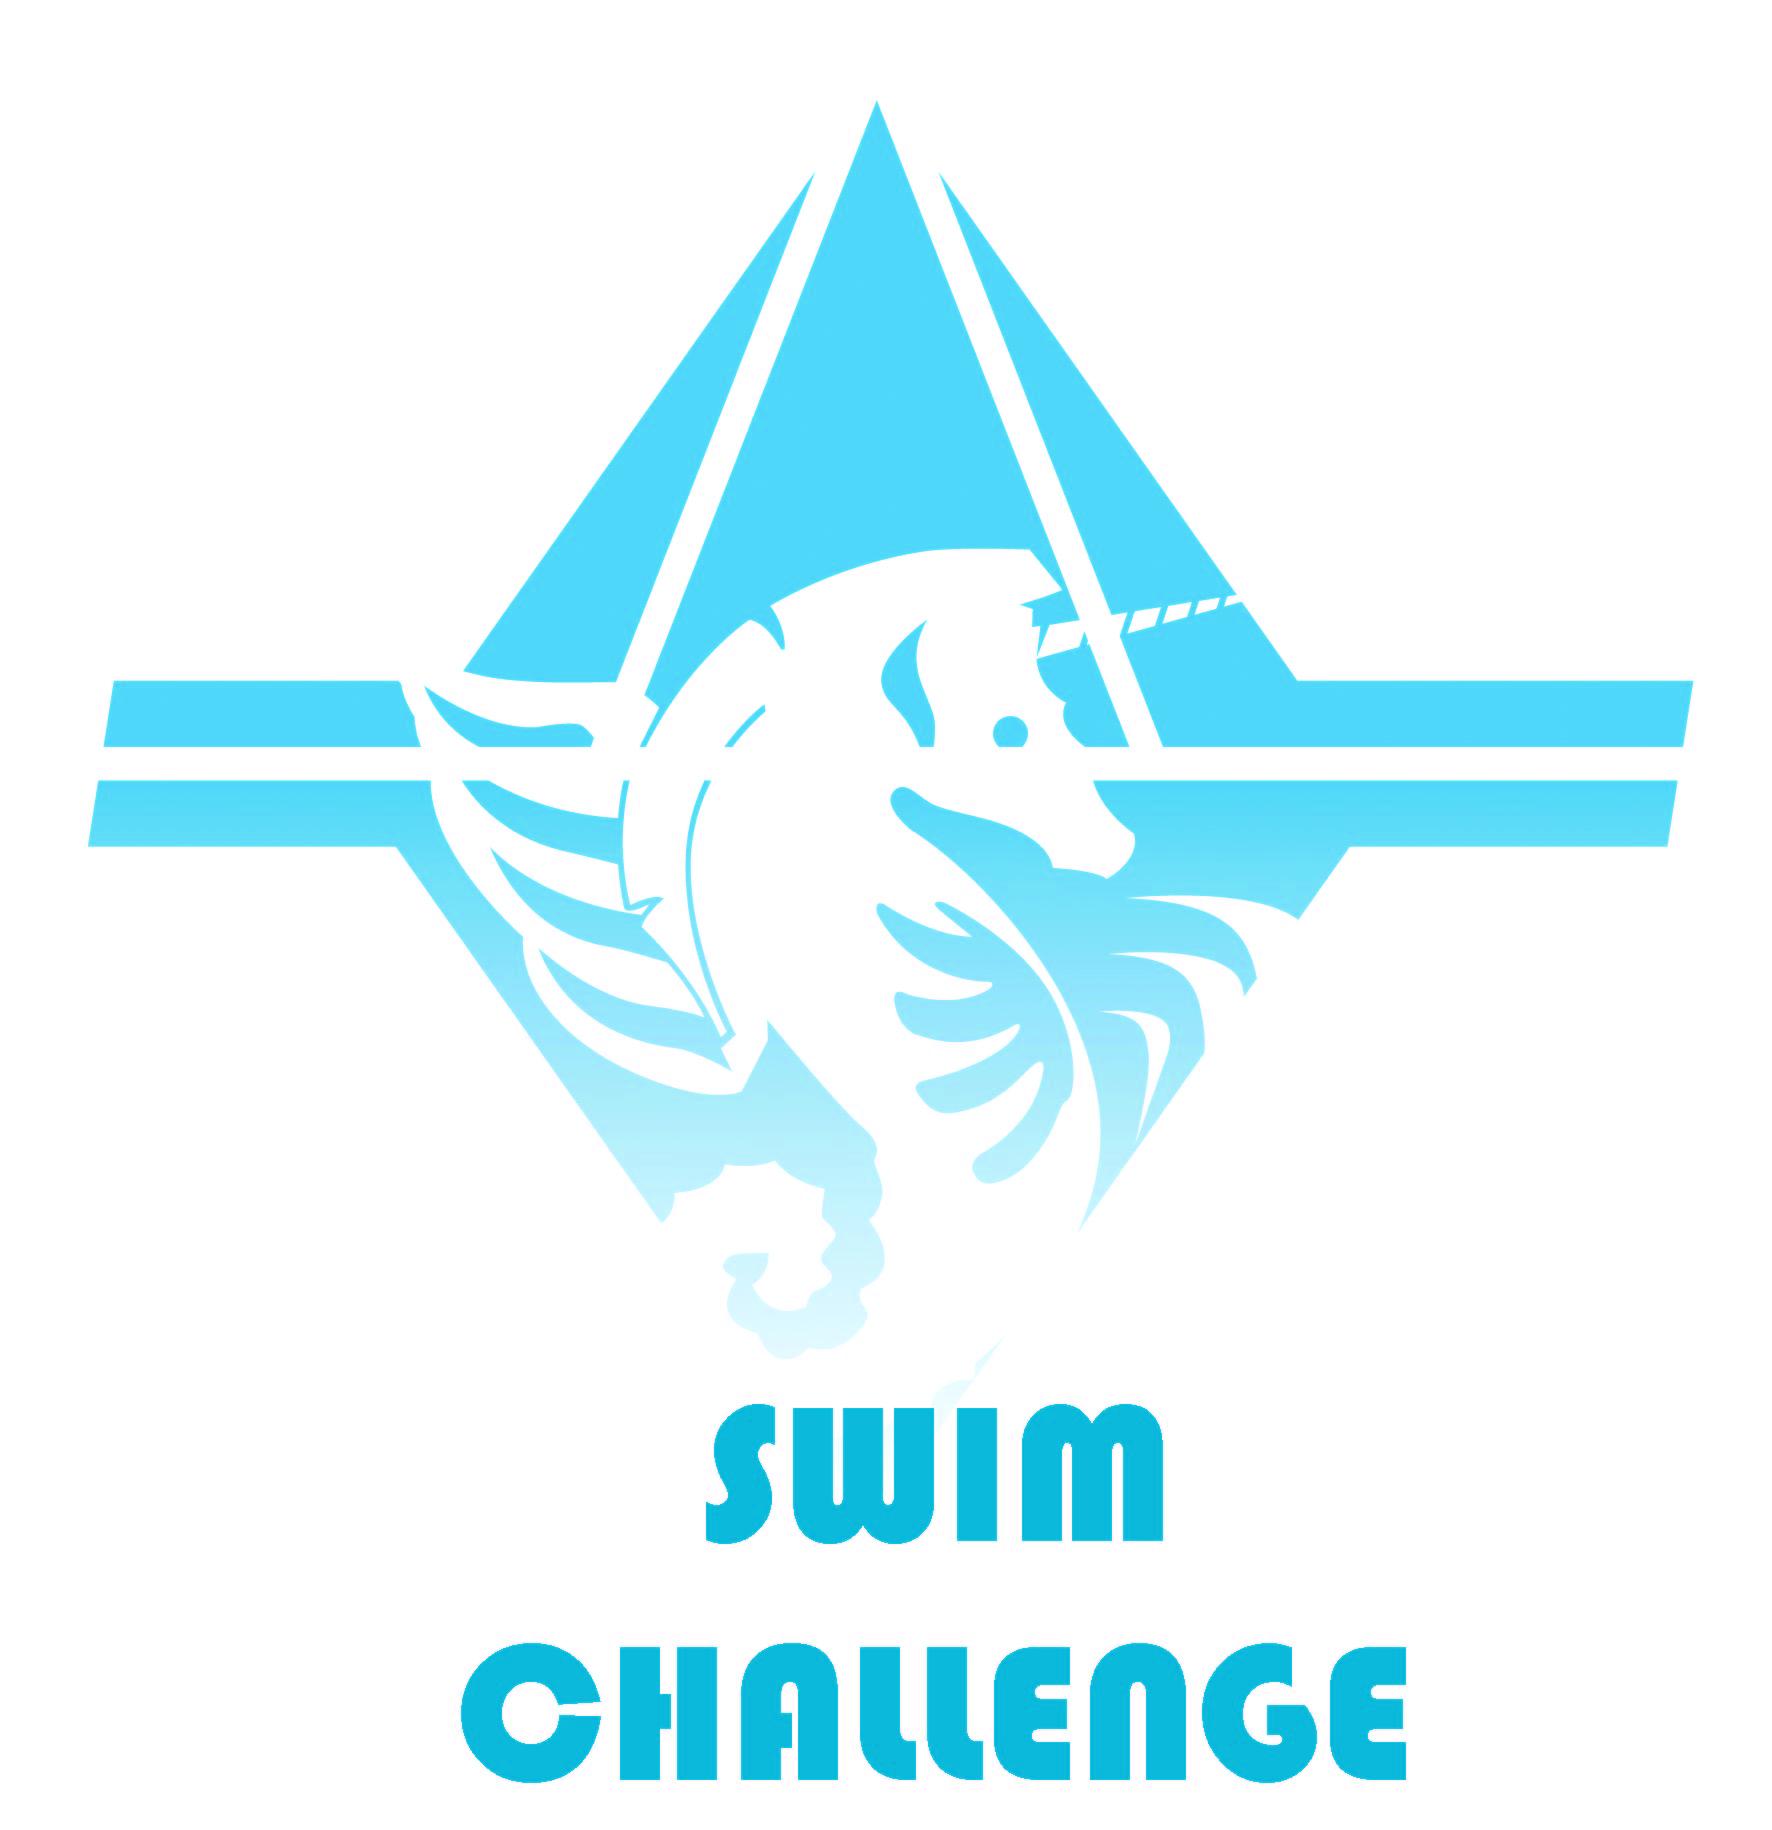 http://www.esprit-challenge.com/wp-content/uploads/2015/03/Eliane.jpeg